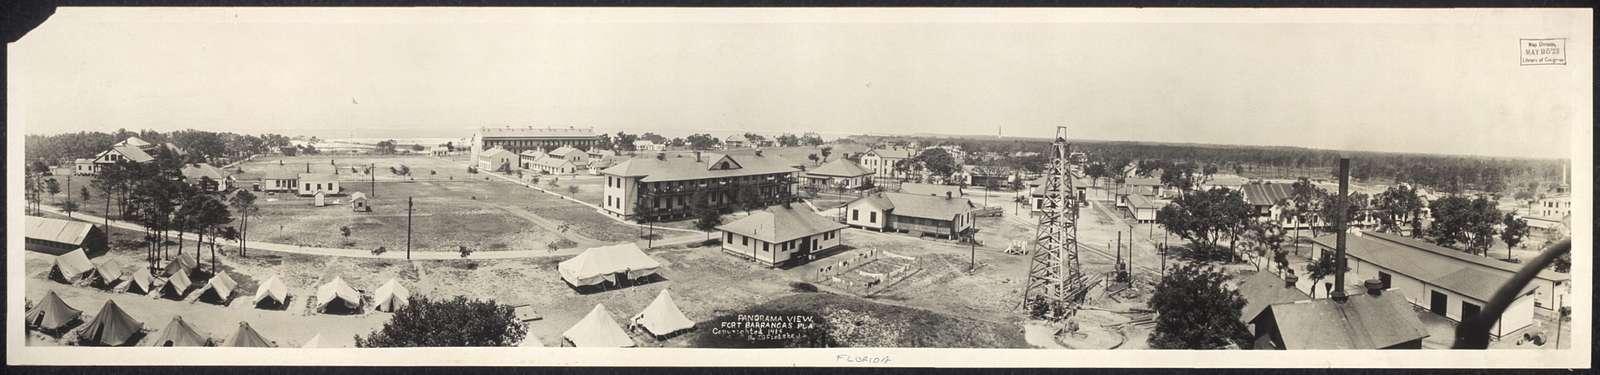 Panorama view, Fort Barrancas, Fla.